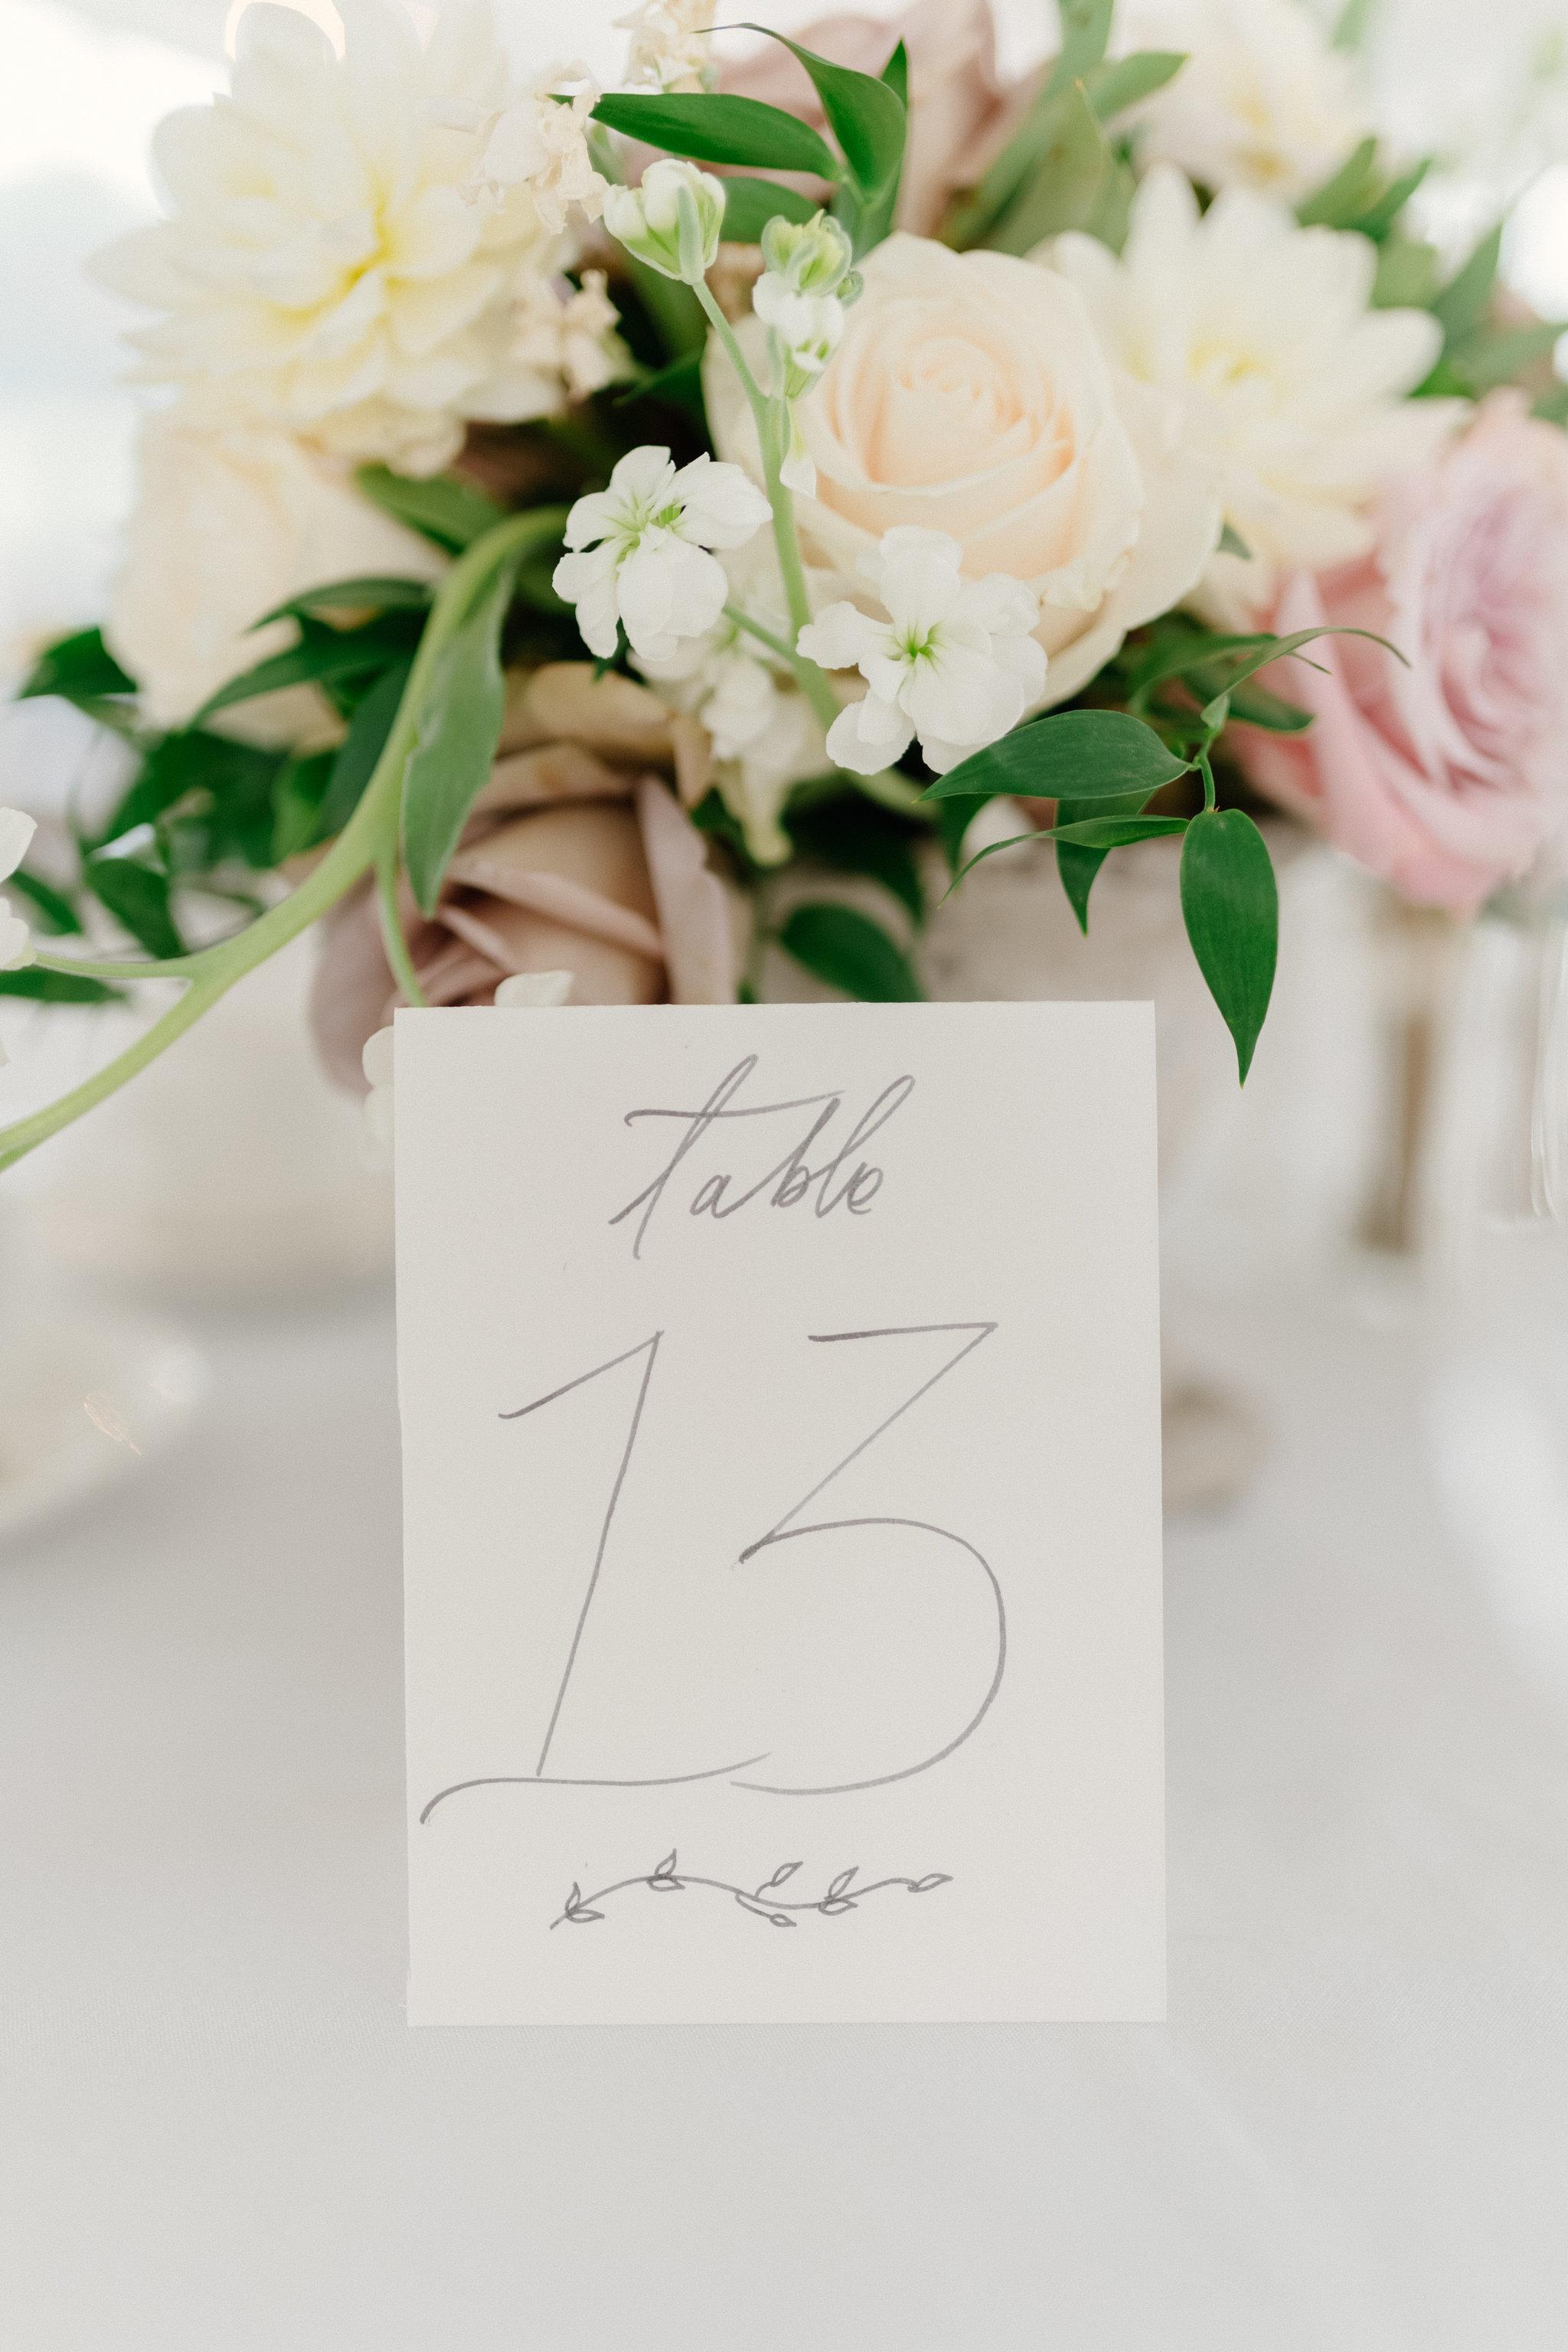 1079-artiese-chateau-des-charmes-wedding-sonia-tim-200988.jpg